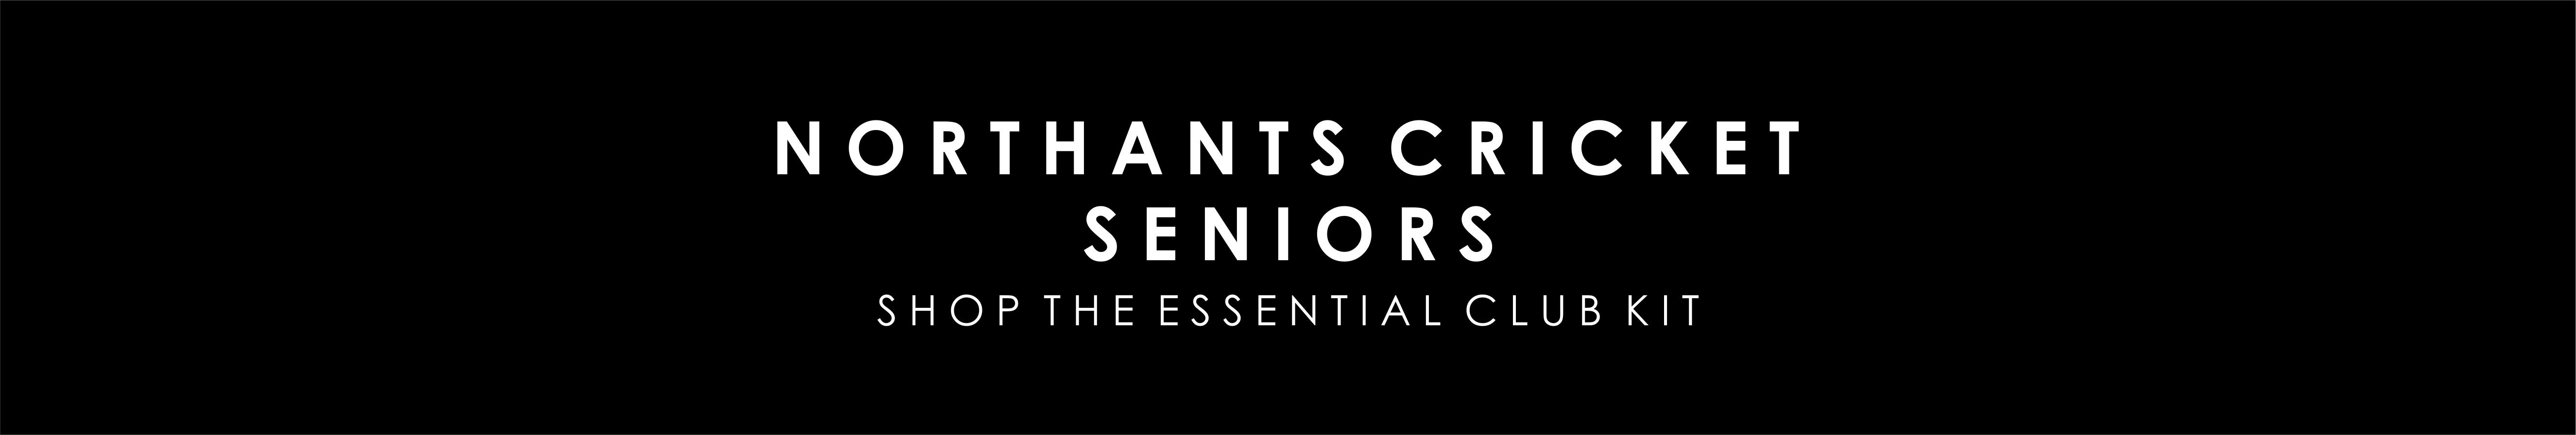 northants-cricket-senior-banner.jpg